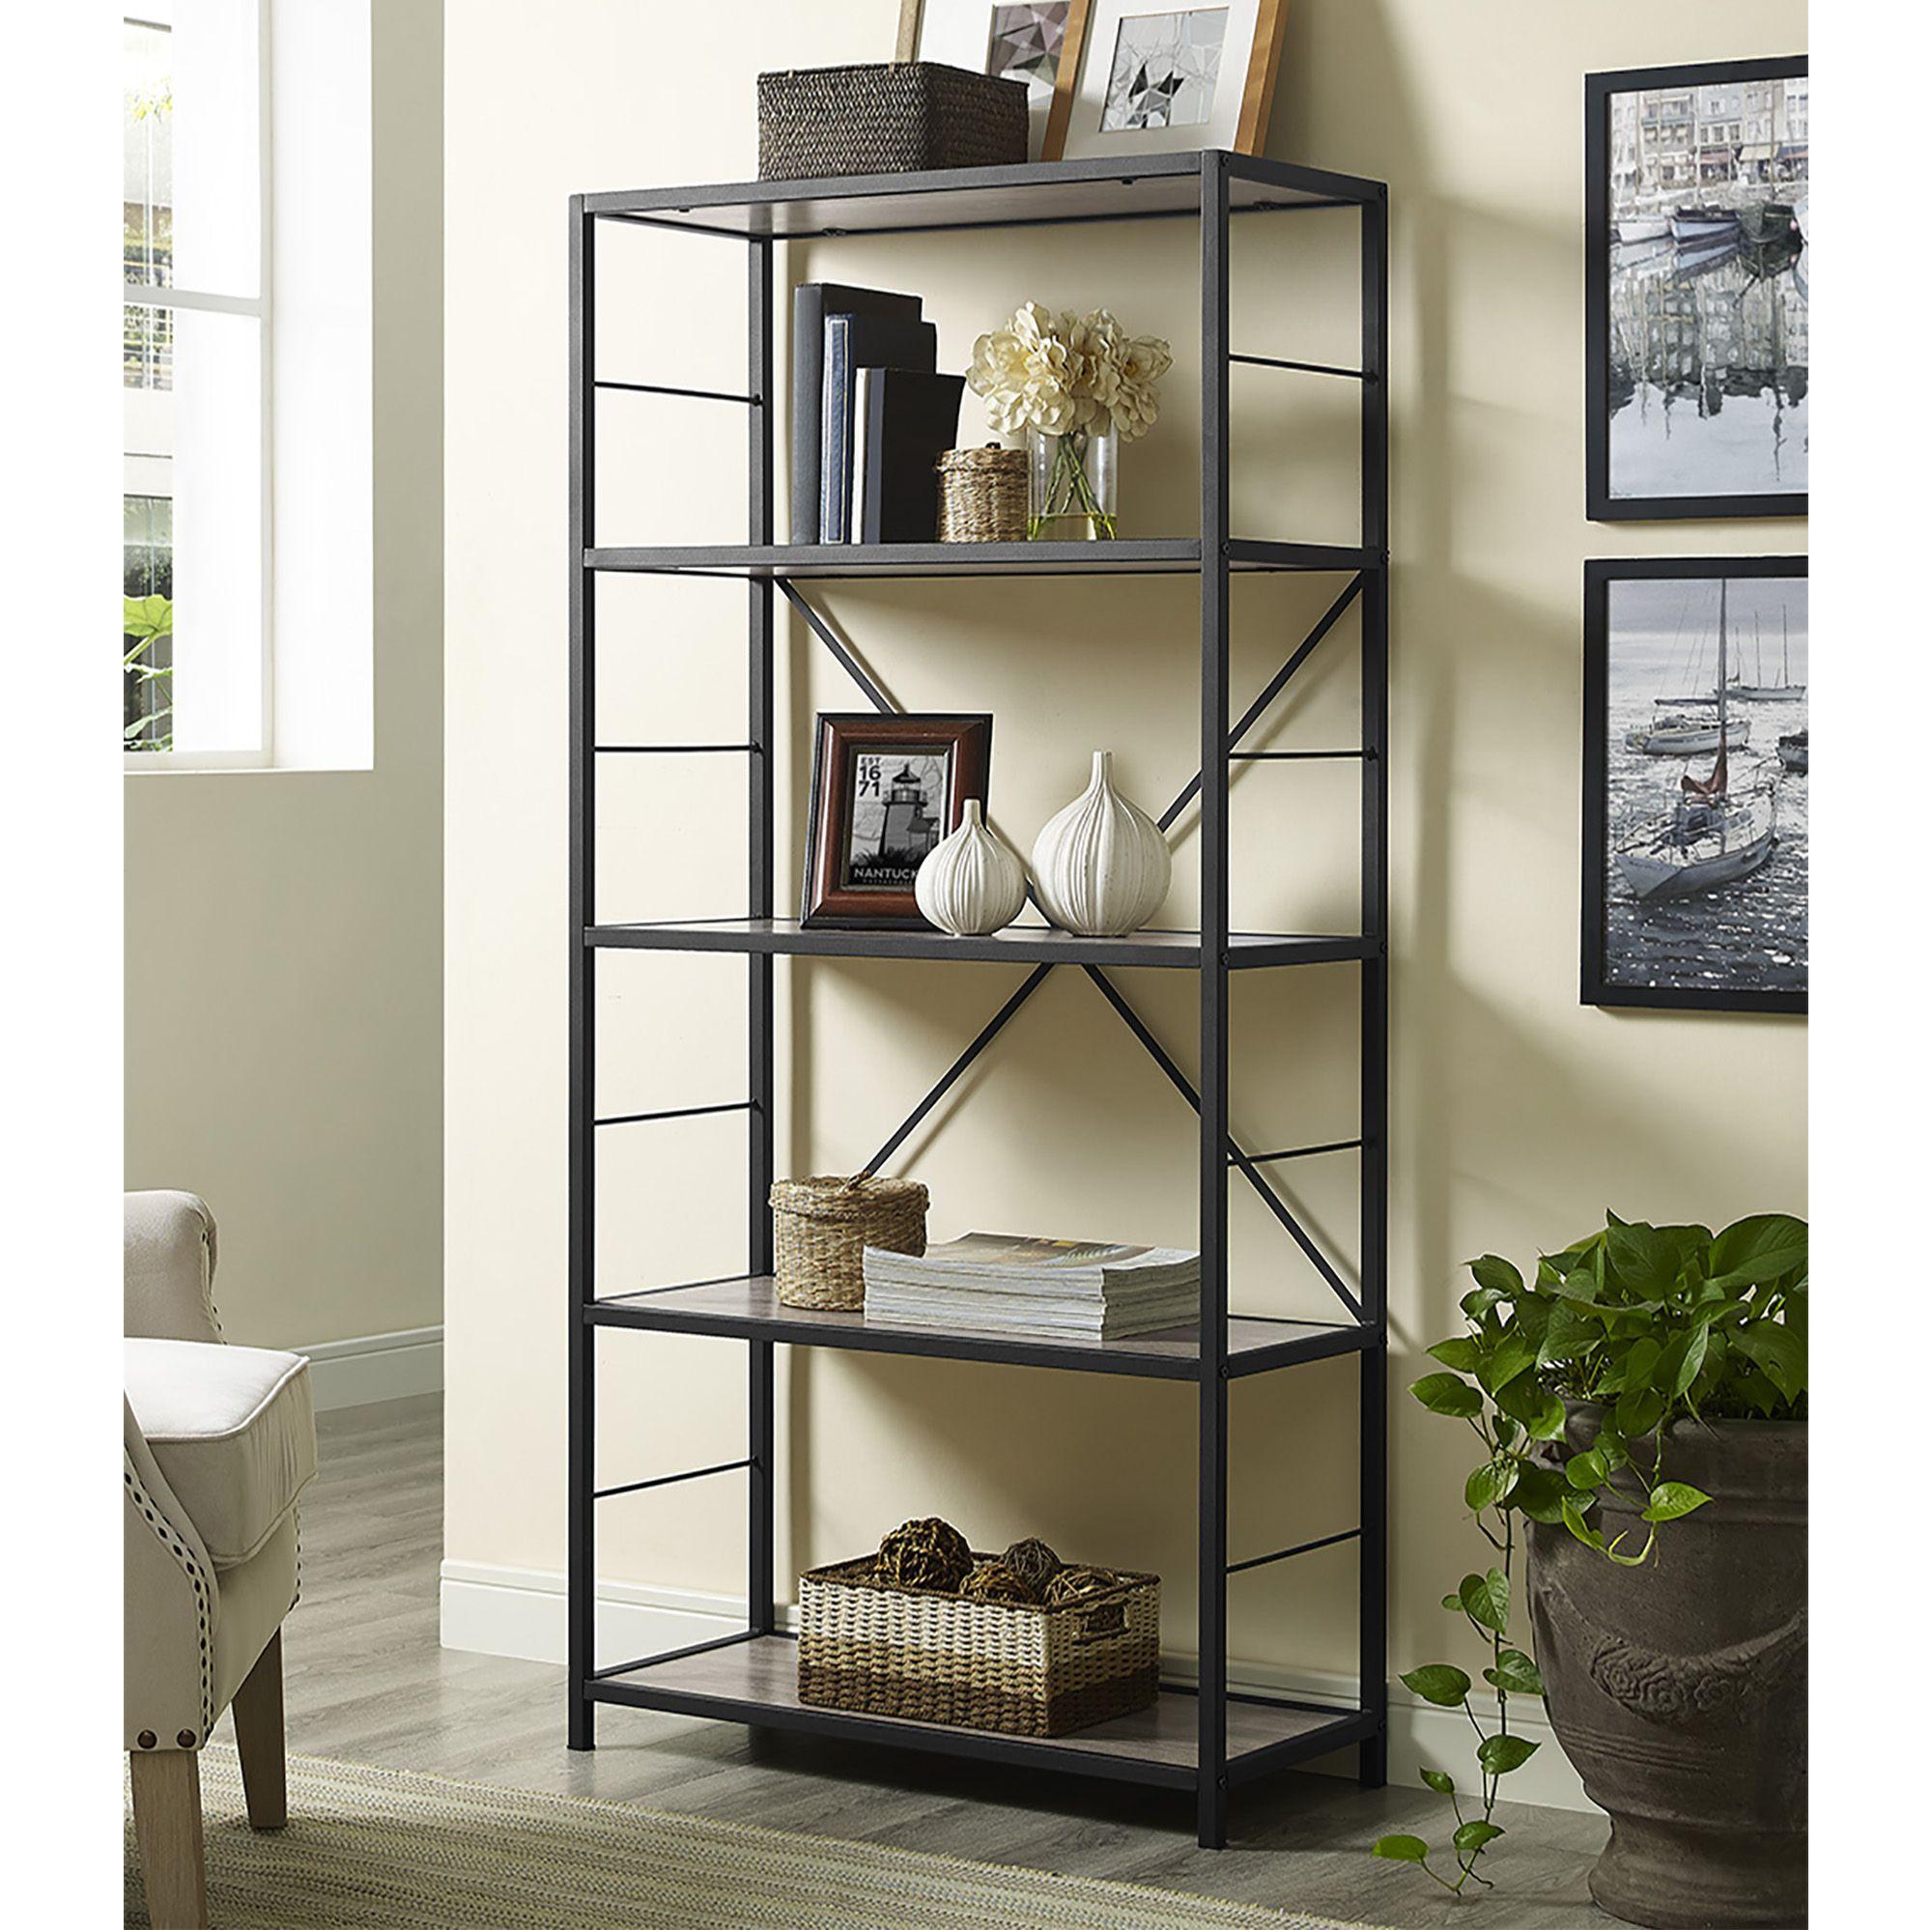 W Trends 60 5 Shelf Rustic Metal And Wood Media Bookshelf Driftwood